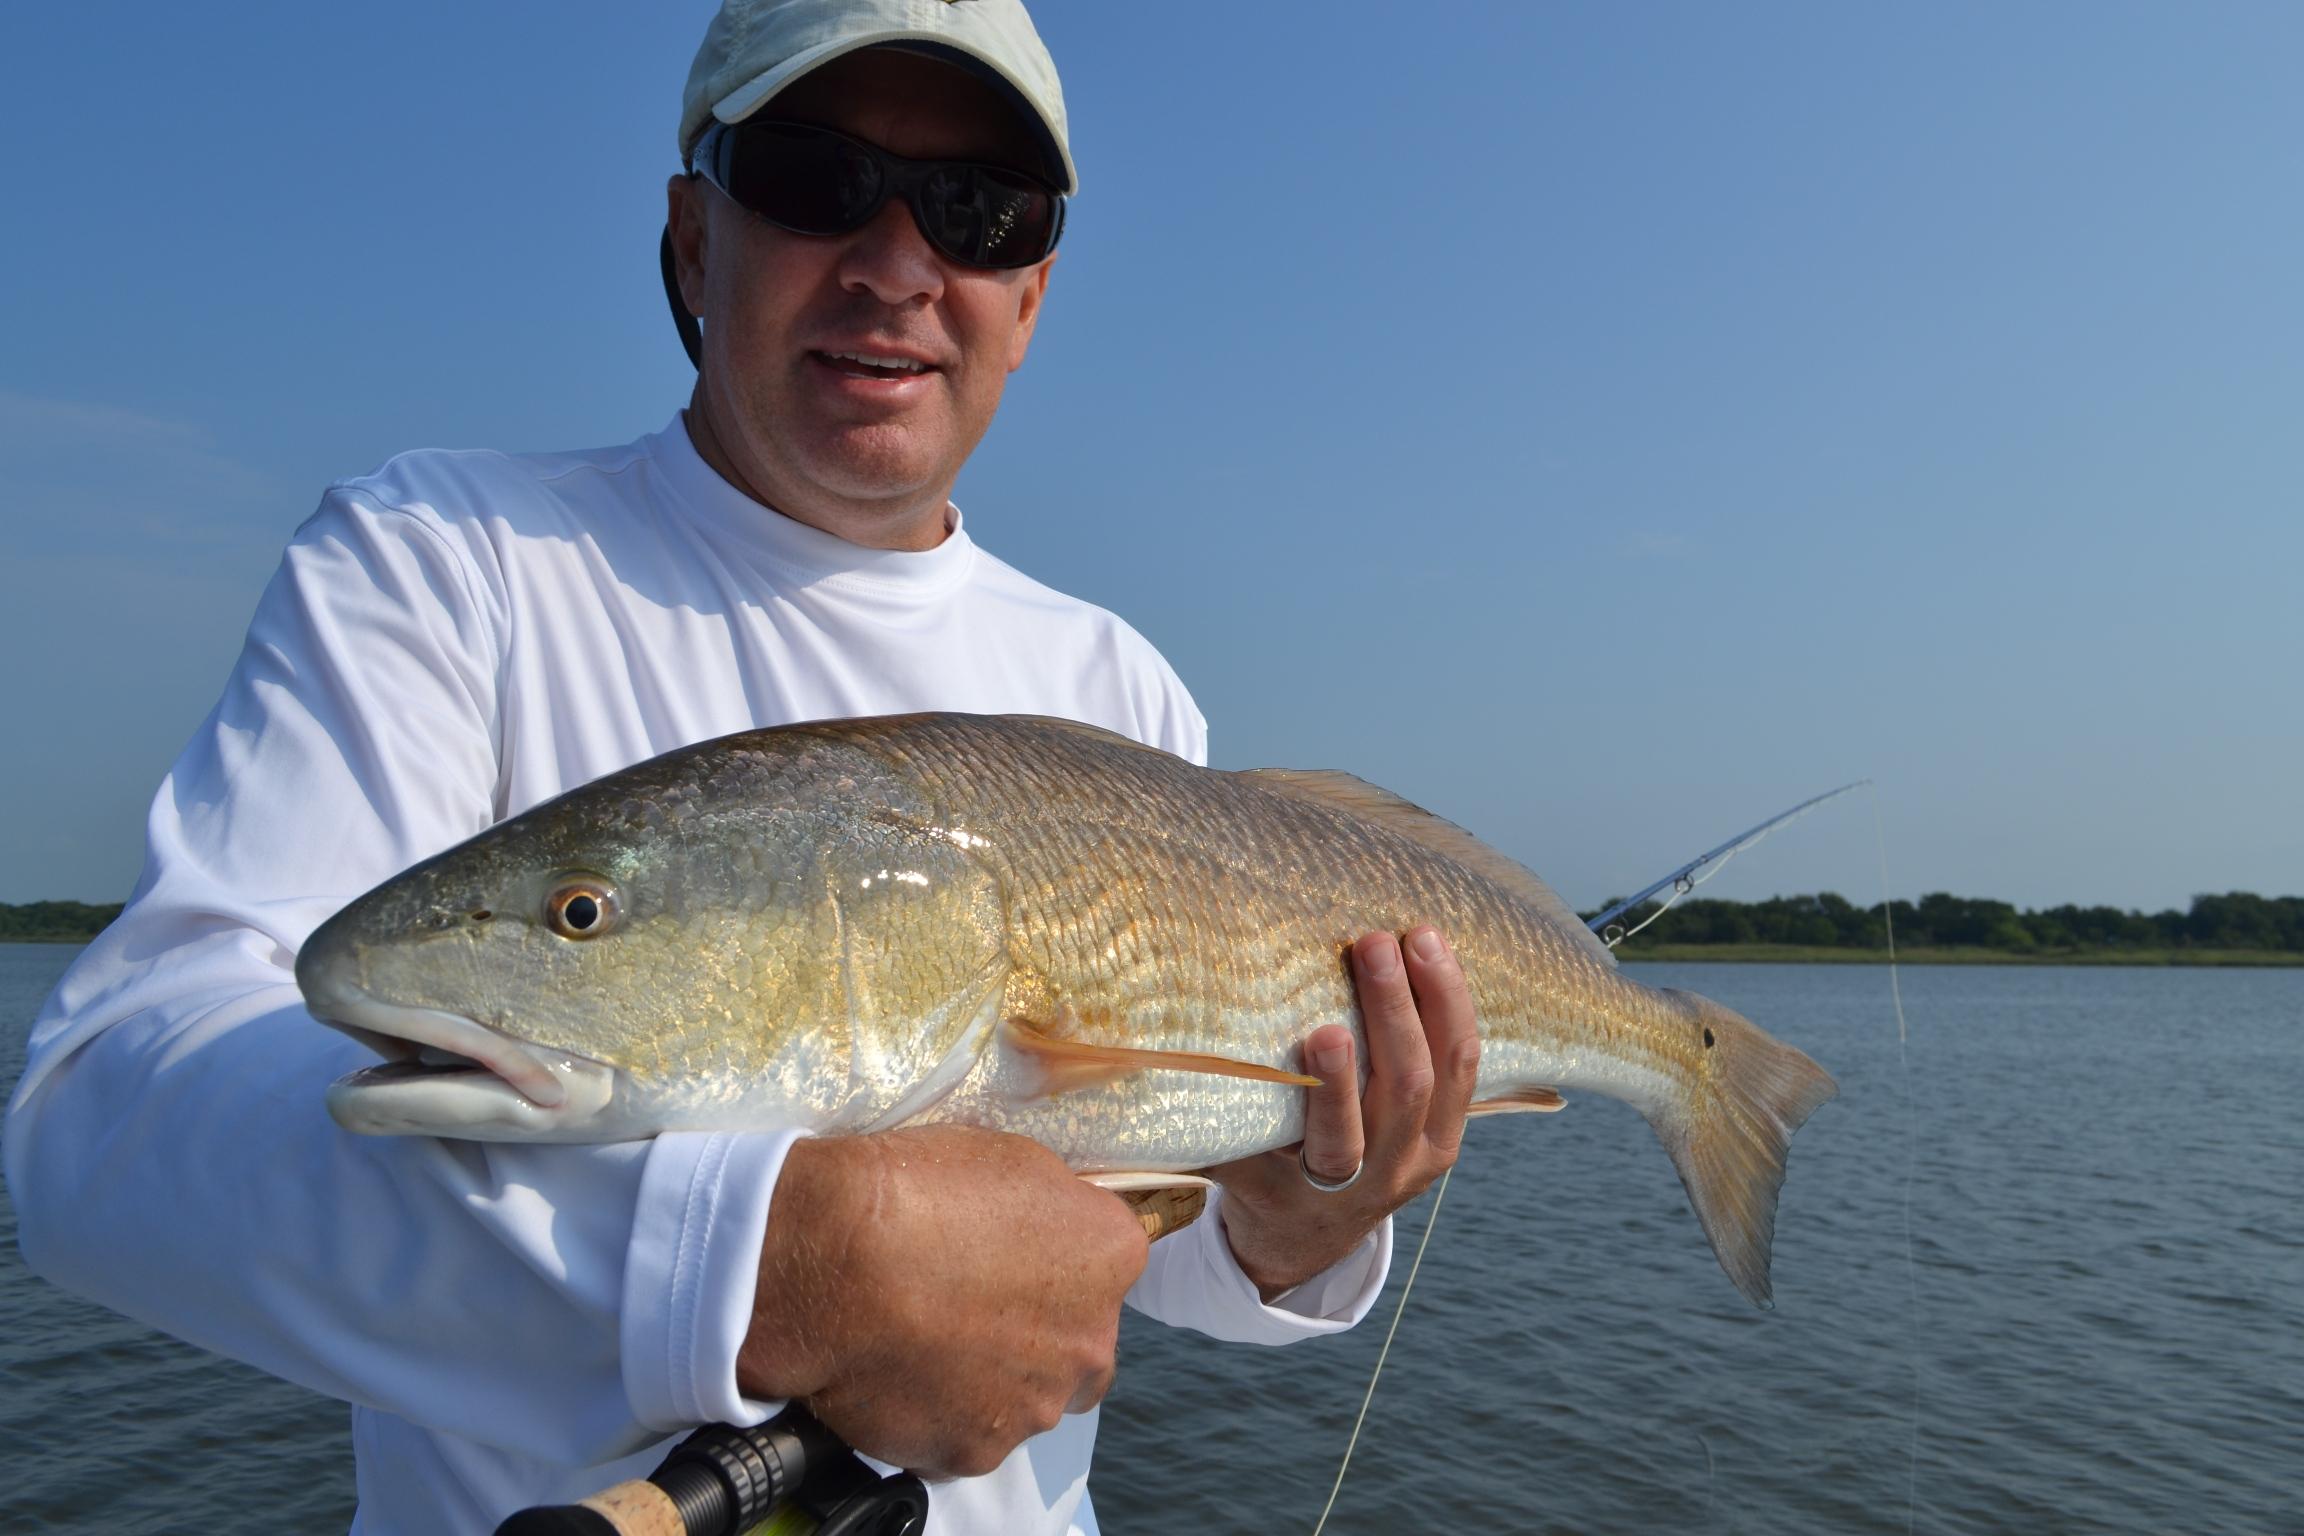 Fly fishing savannah and hilton head for Flying fish savannah ga